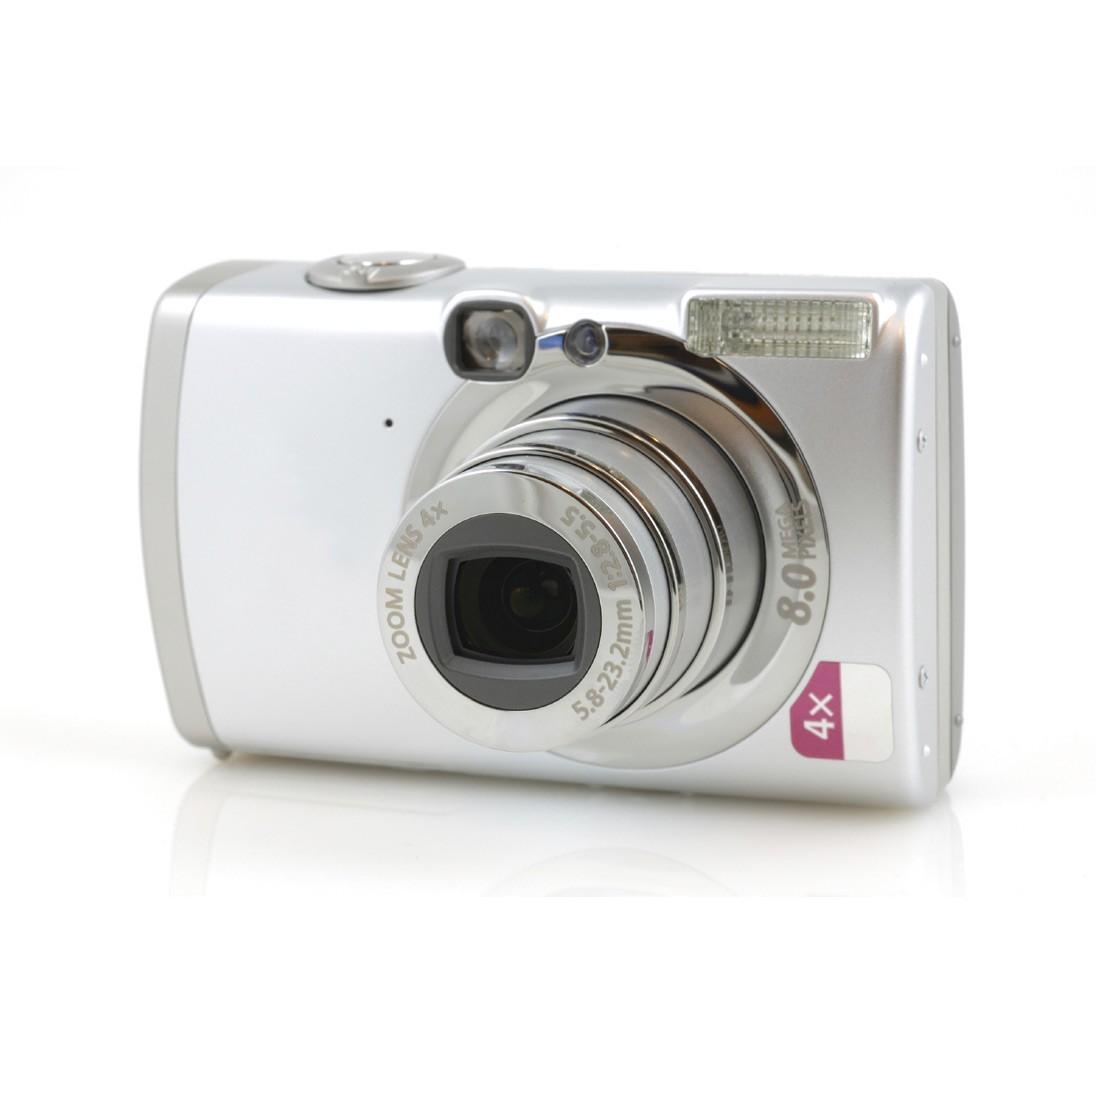 Kodak EasyShare C530 5MP Digital Camera